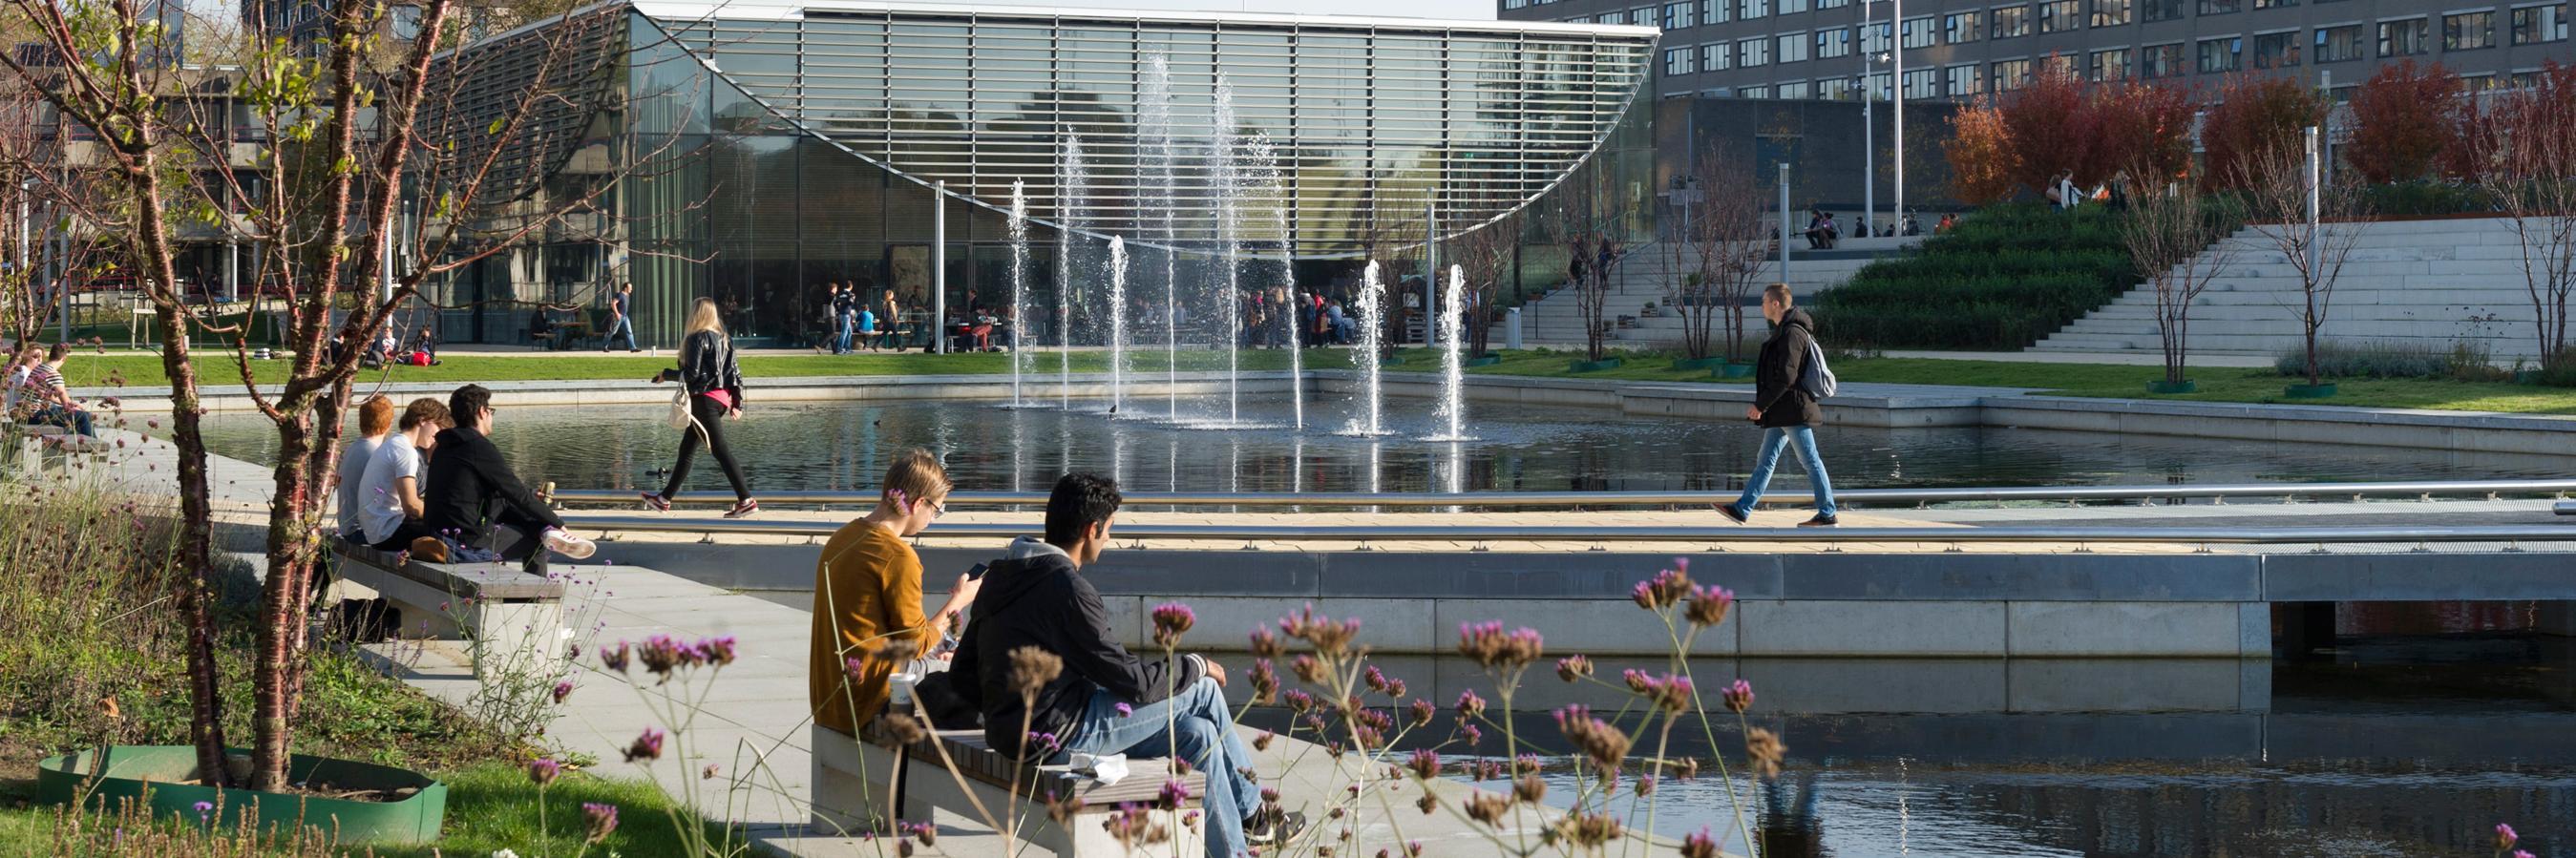 Erasmus Universiteit Rotterdam's official Twitter account